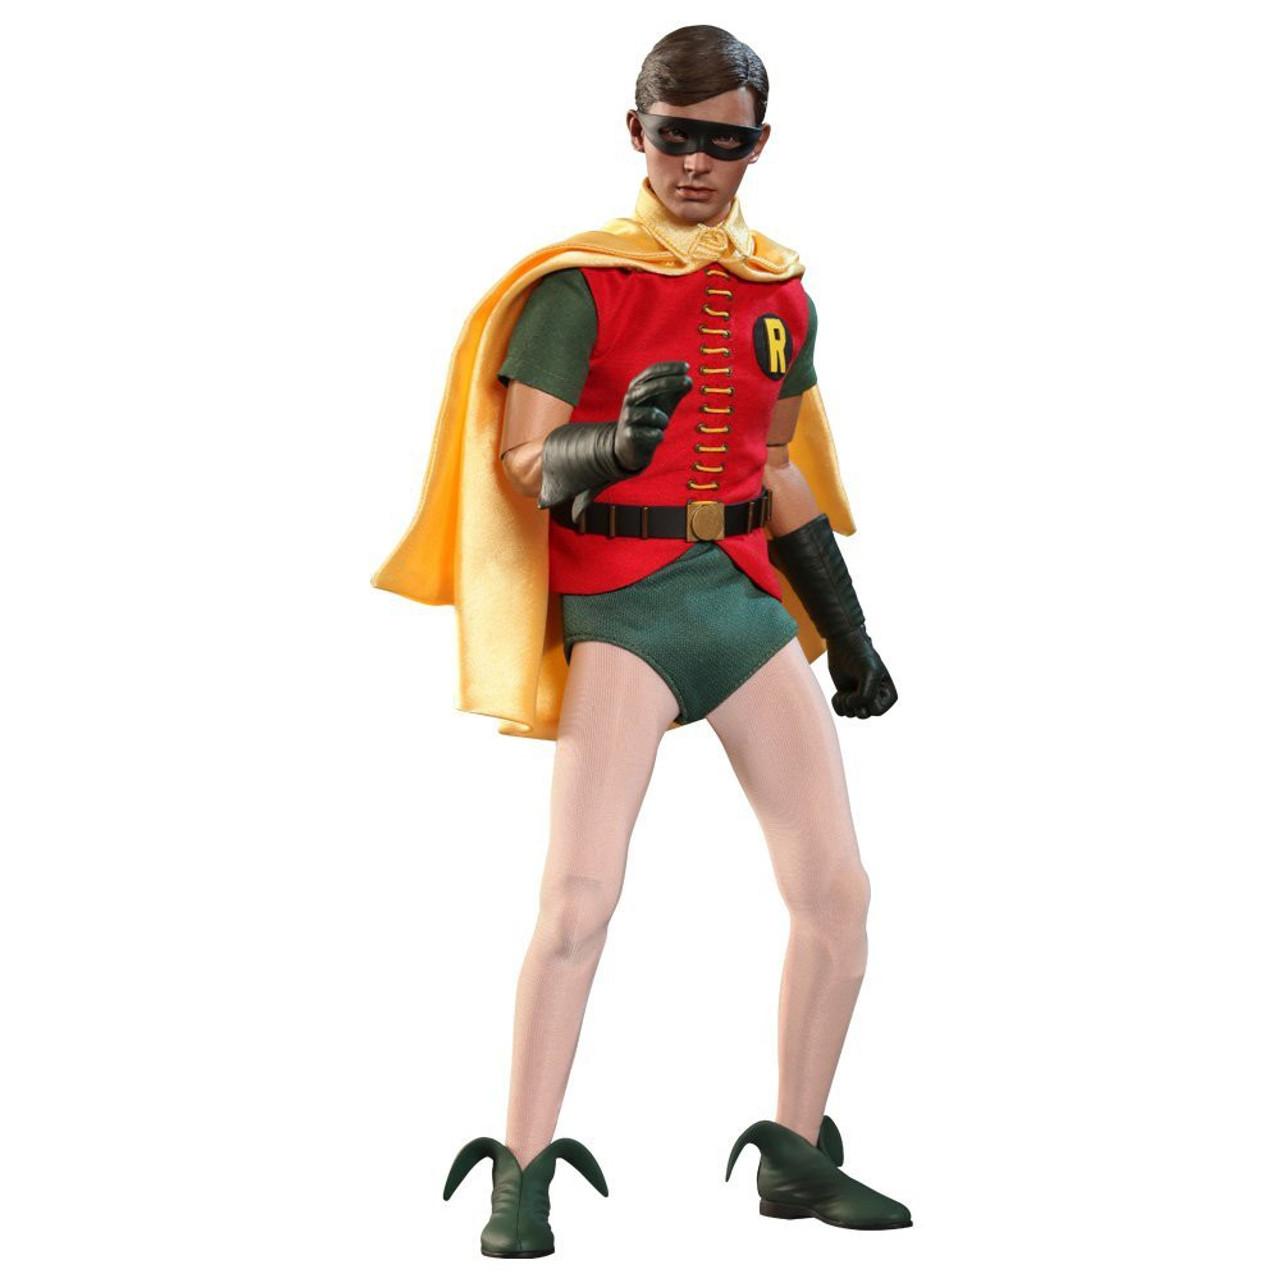 Batman 1966 TV Series Movie Masterpiece Robin 1/6 Collectible Figure